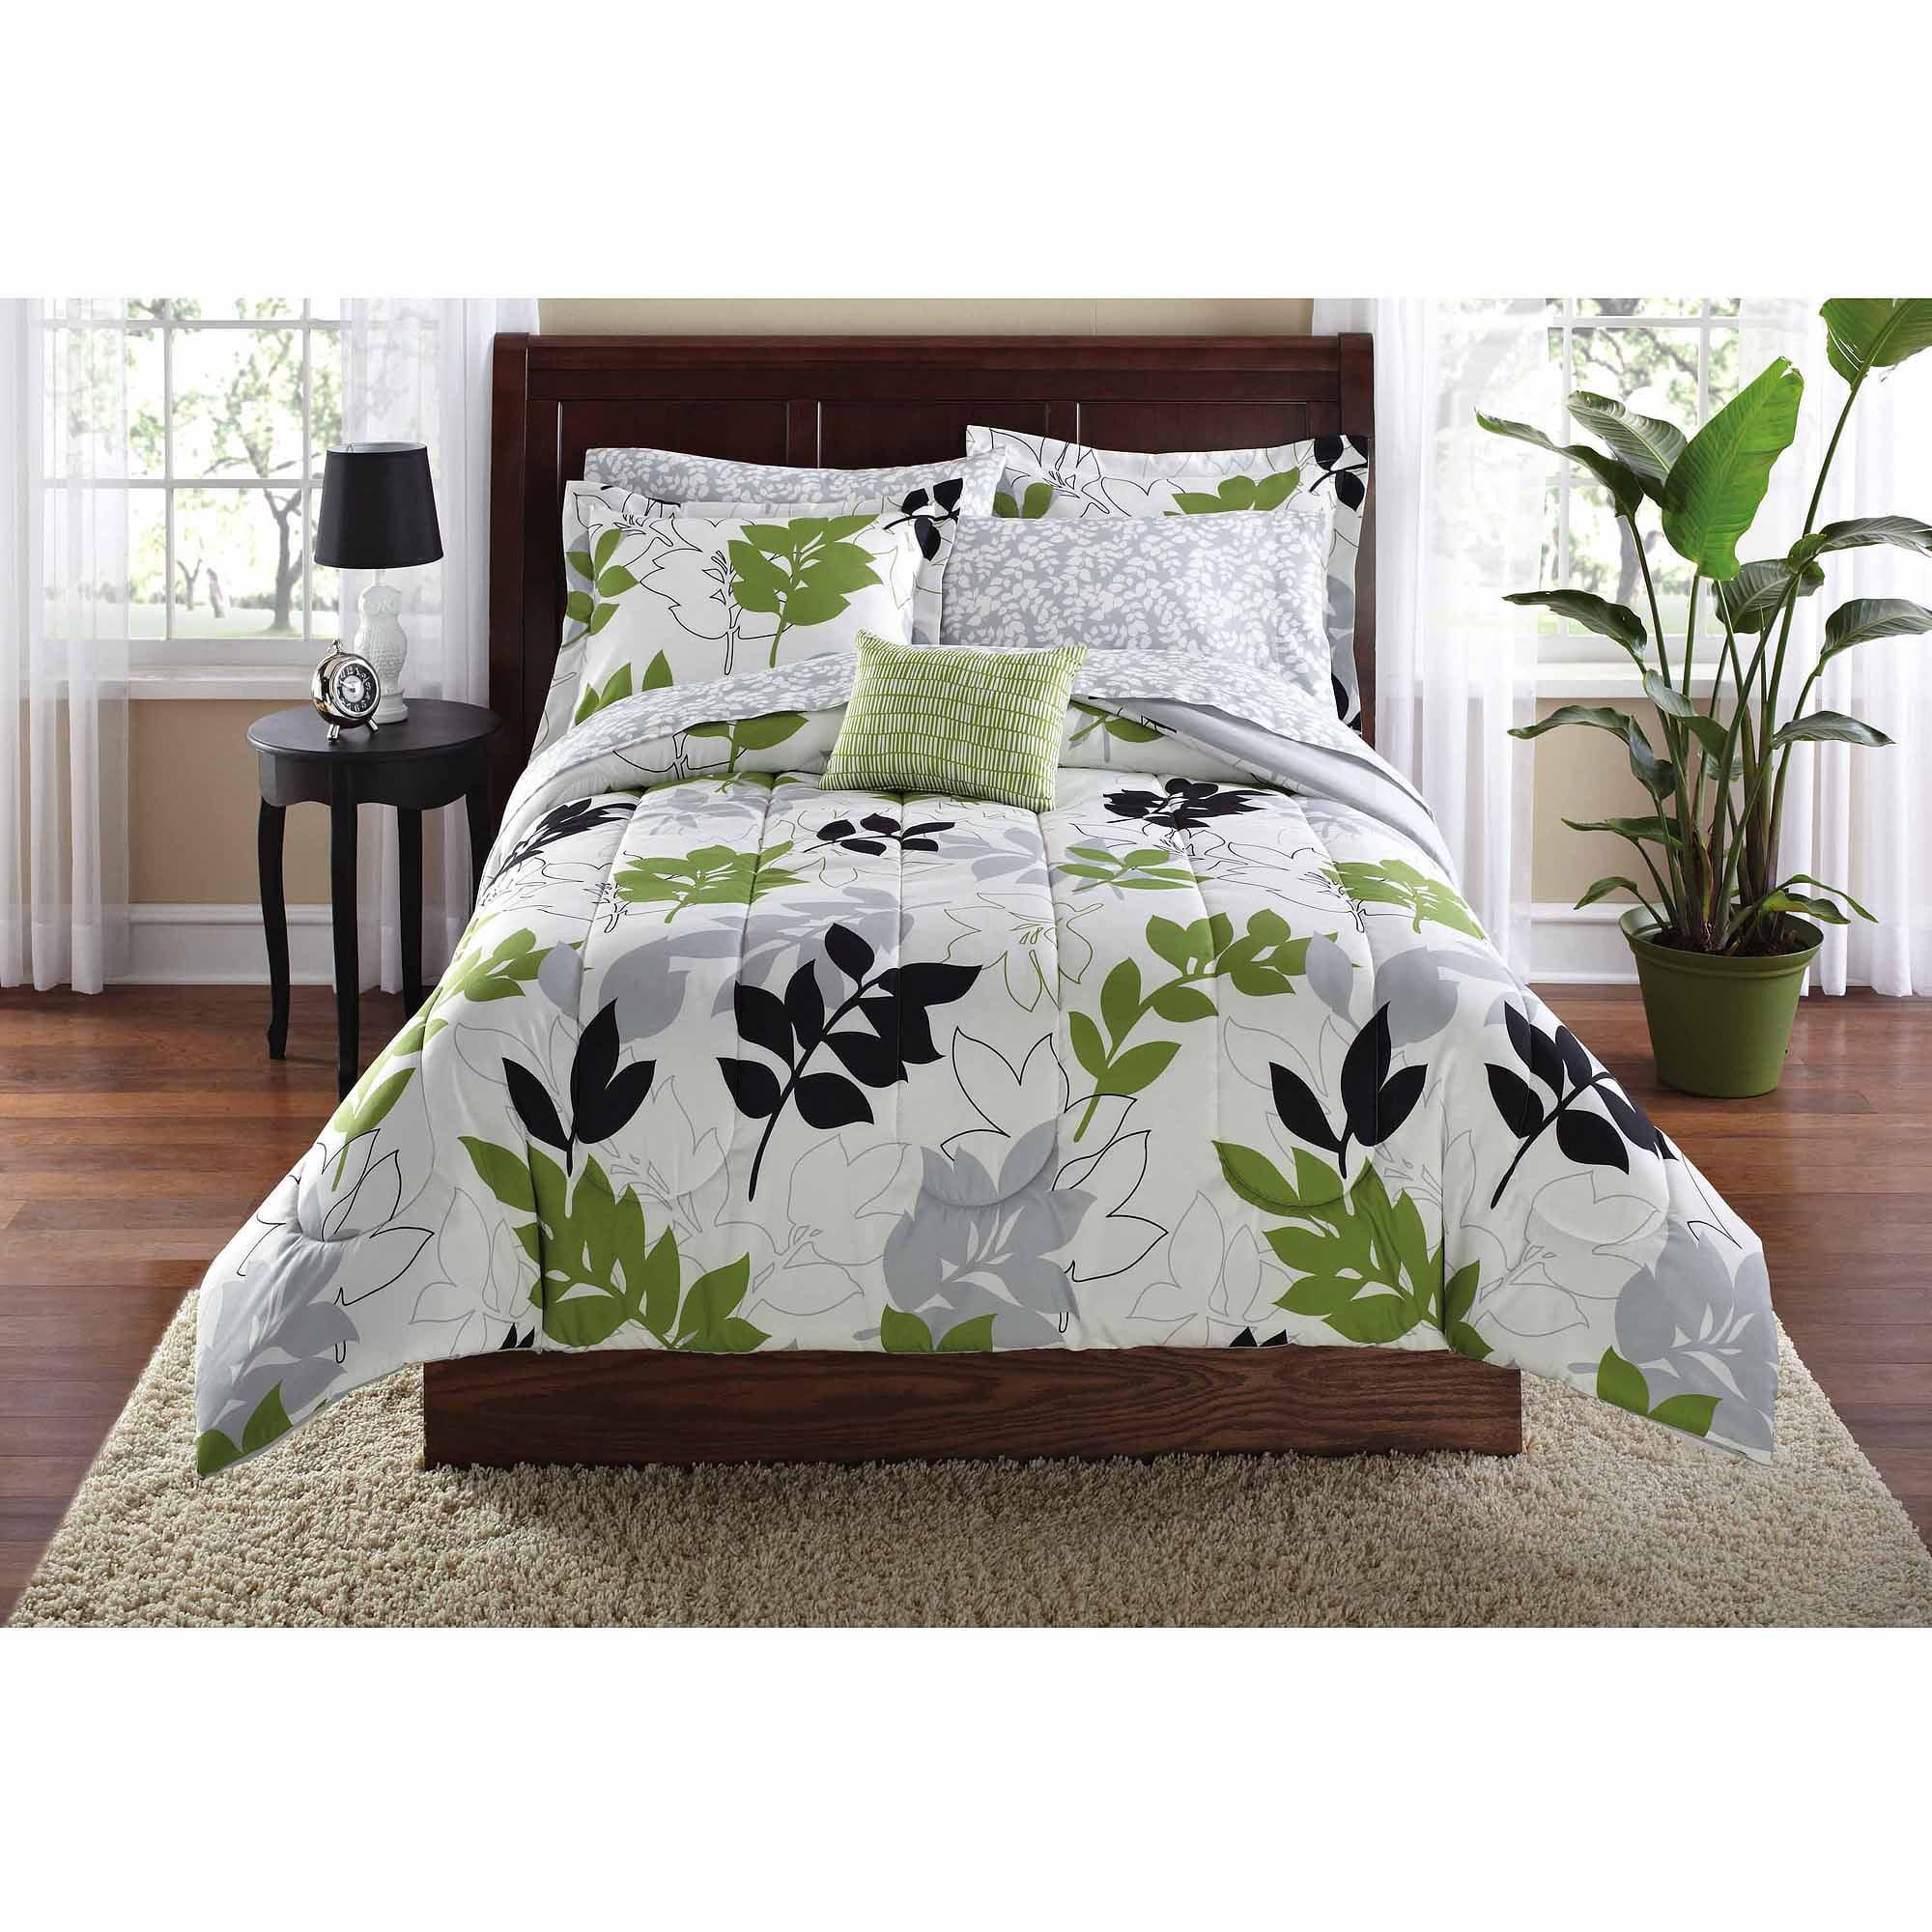 Top Mainstays Botanical Leaf Bed in a Bag Coordinated Bedding Set  FI68